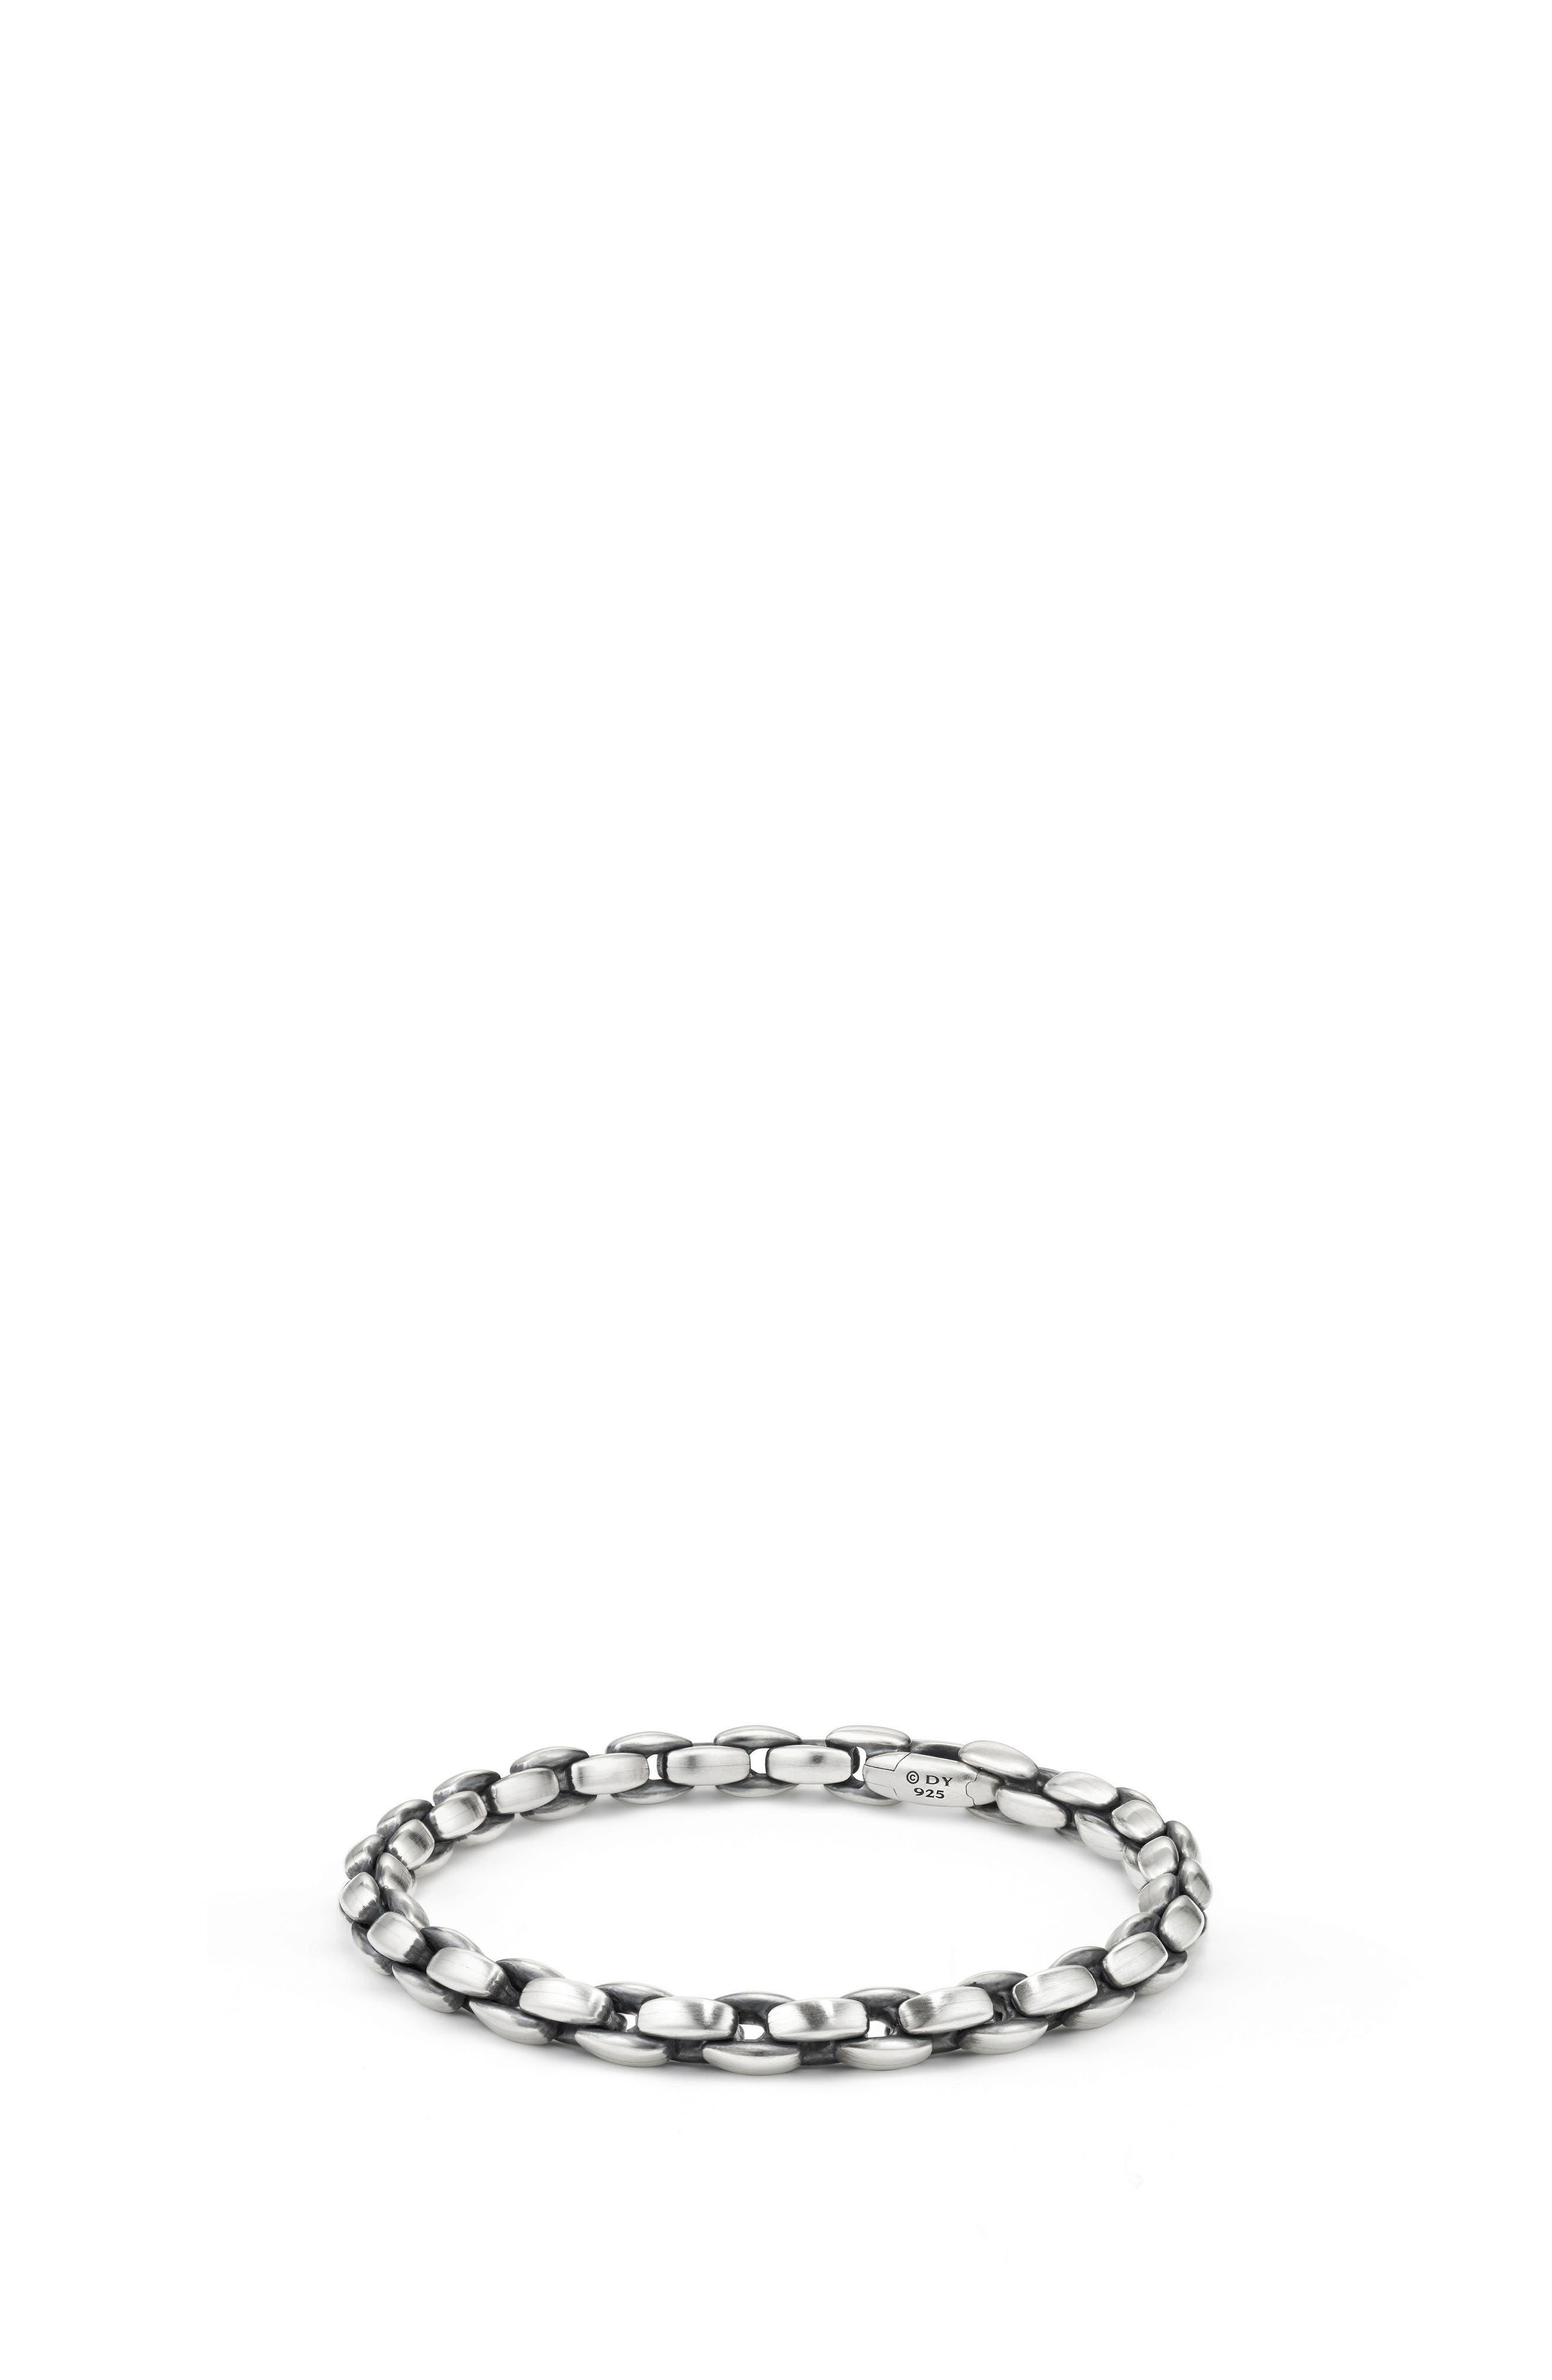 Alternate Image 1 Selected - David Yurman Elongated Box Chain Bracelet, 6mm